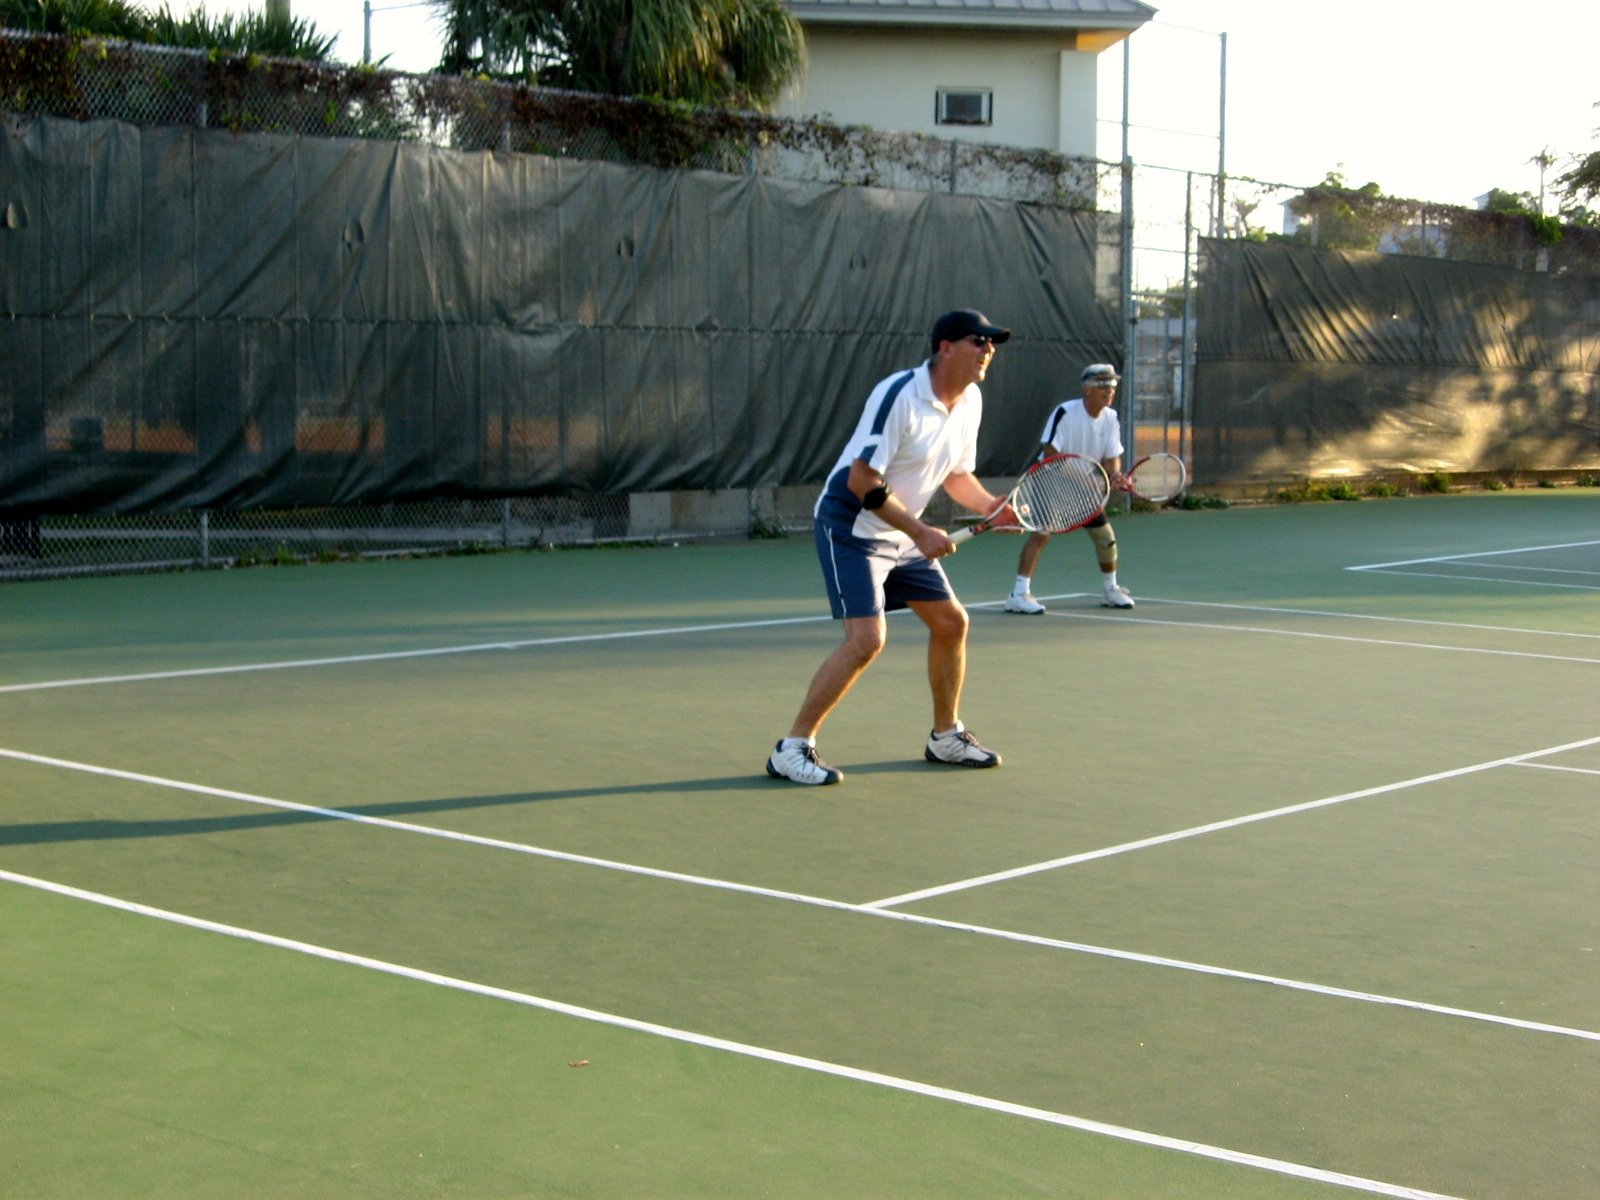 tennis-tourist-bay-view-tennis-courts-key-west-teri-church